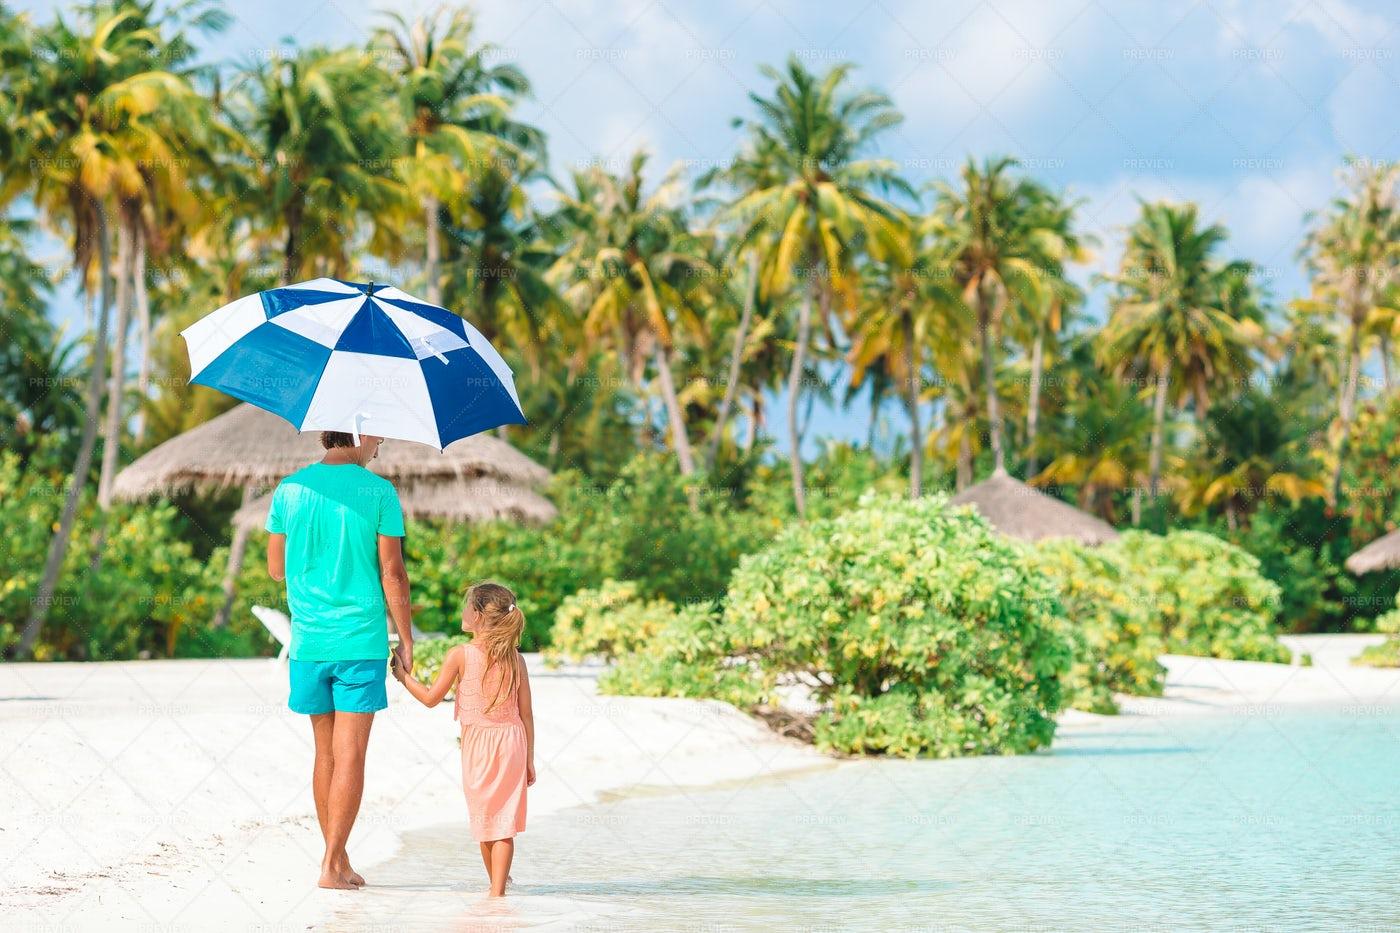 On The Beach With An Umbrella: Stock Photos